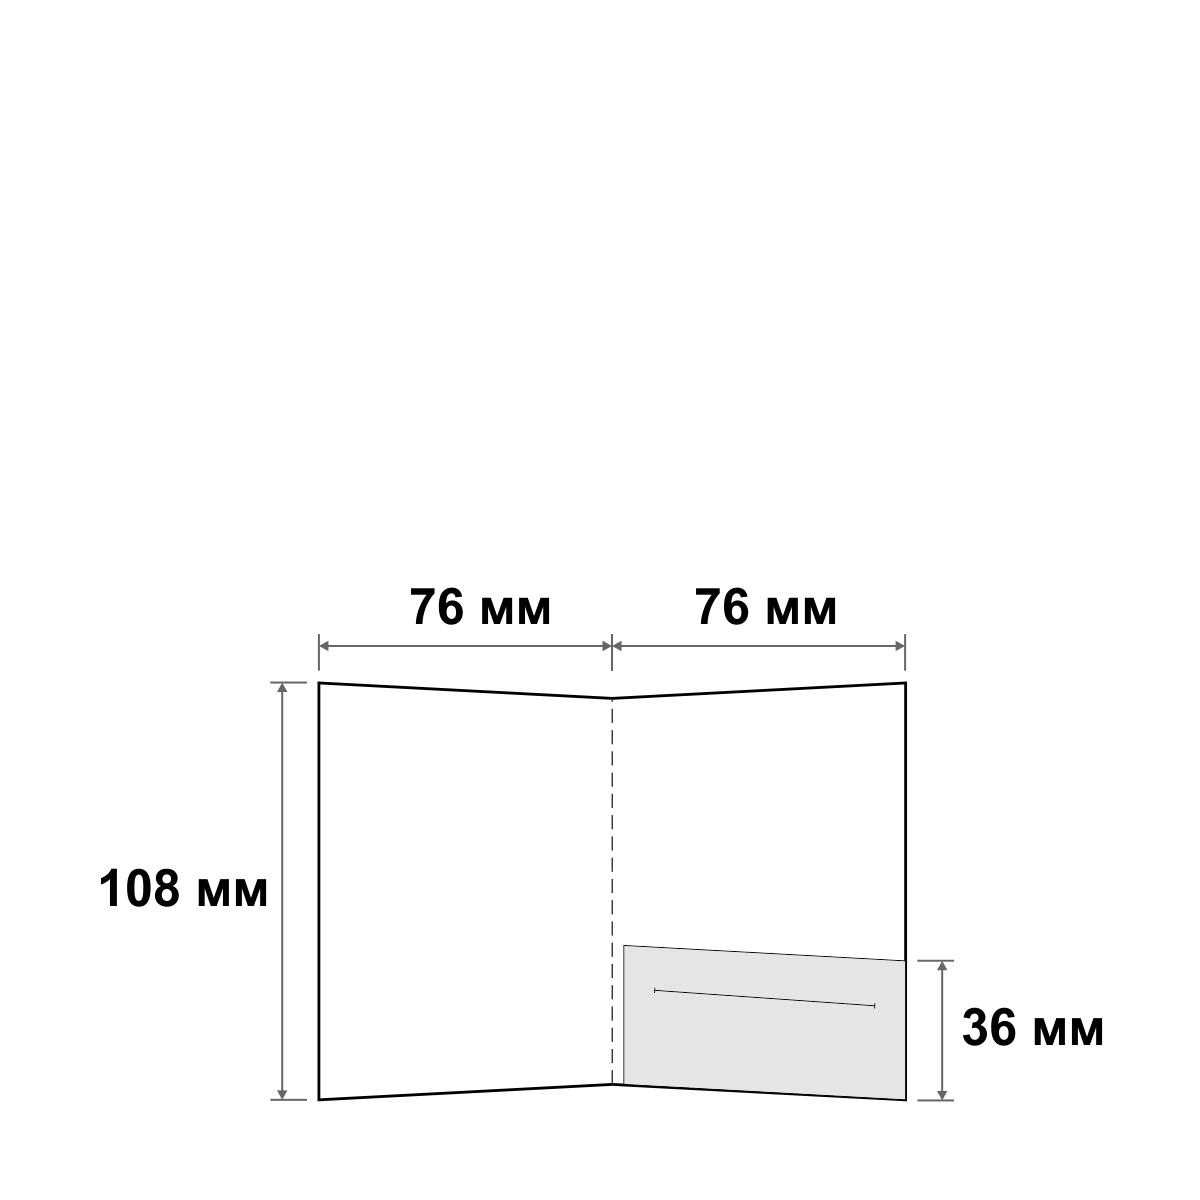 Кейхолдер для ключ карты отеля 76х108 мм с прорезью